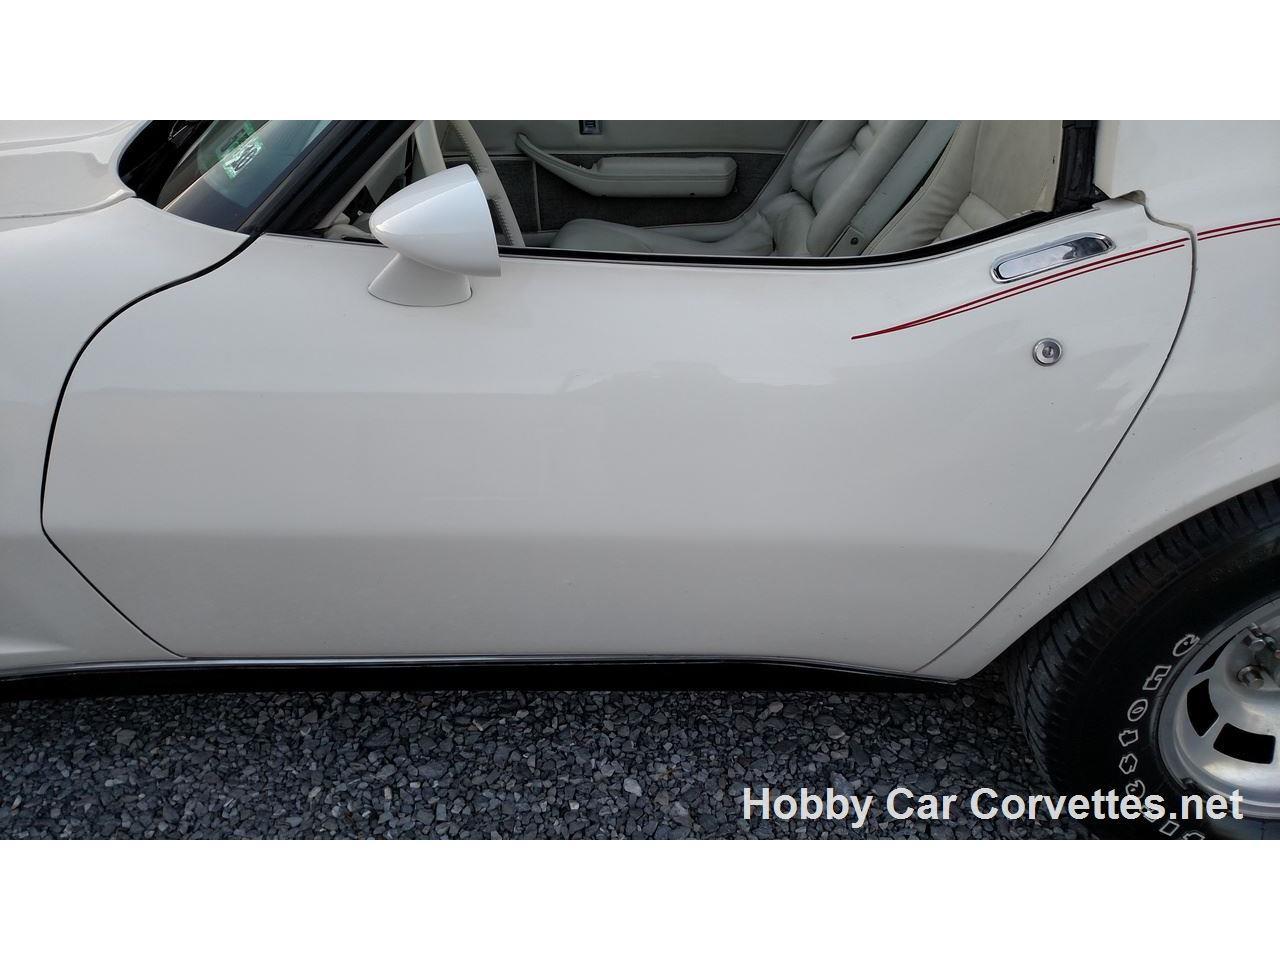 Large Picture of '79 Corvette located in Martinsburg Pennsylvania - $14,999.00 - KMMI